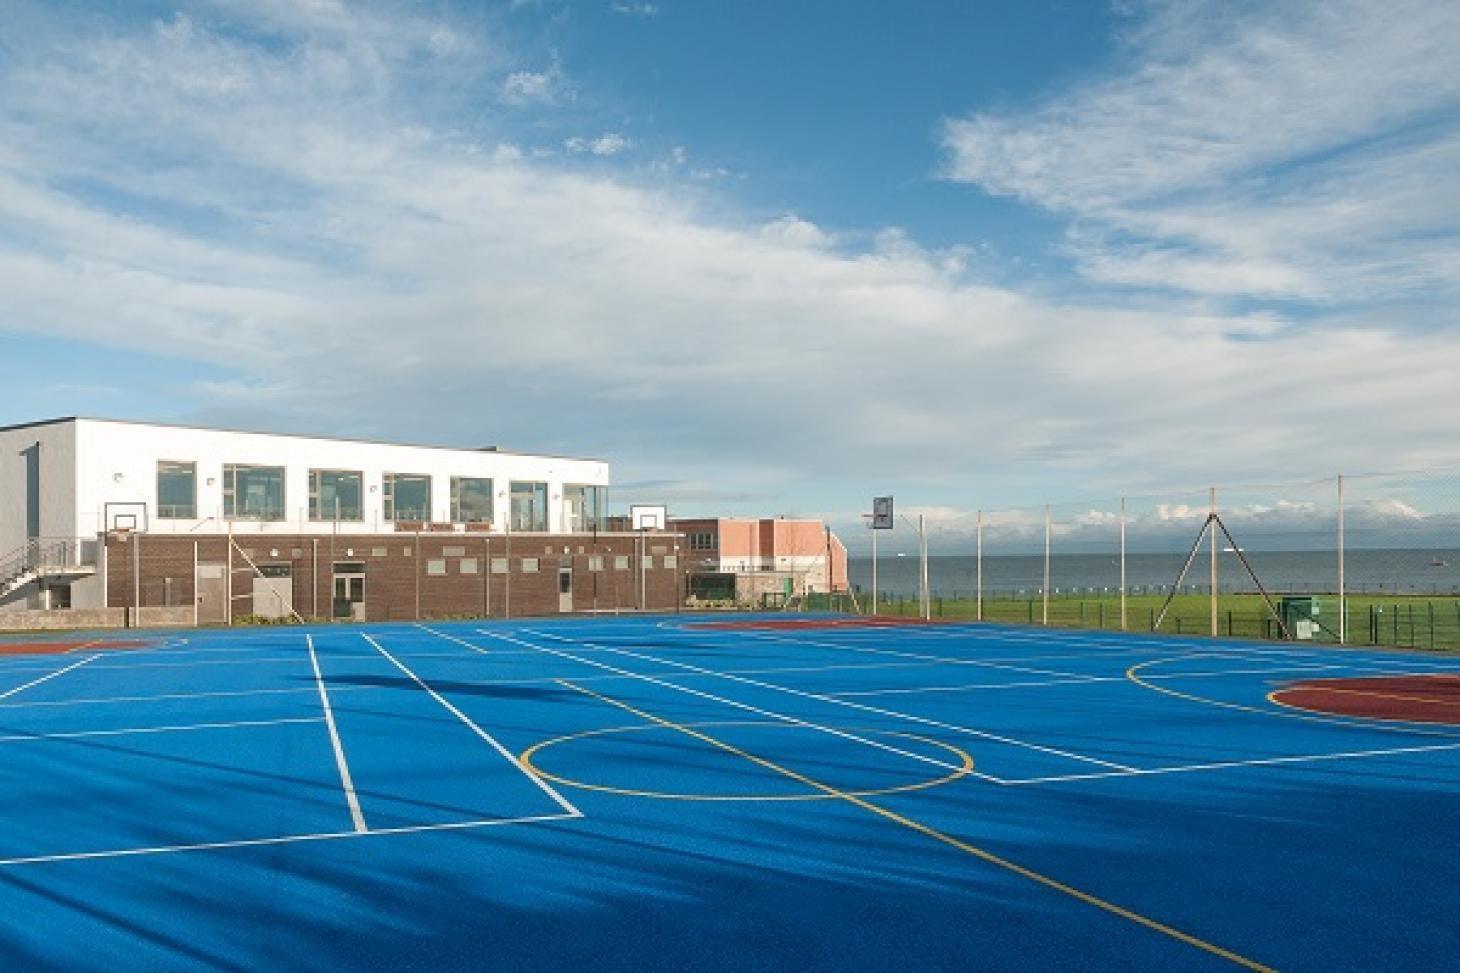 Loreto Abbey Sports Hall Outdoor | Hard (macadam) tennis court